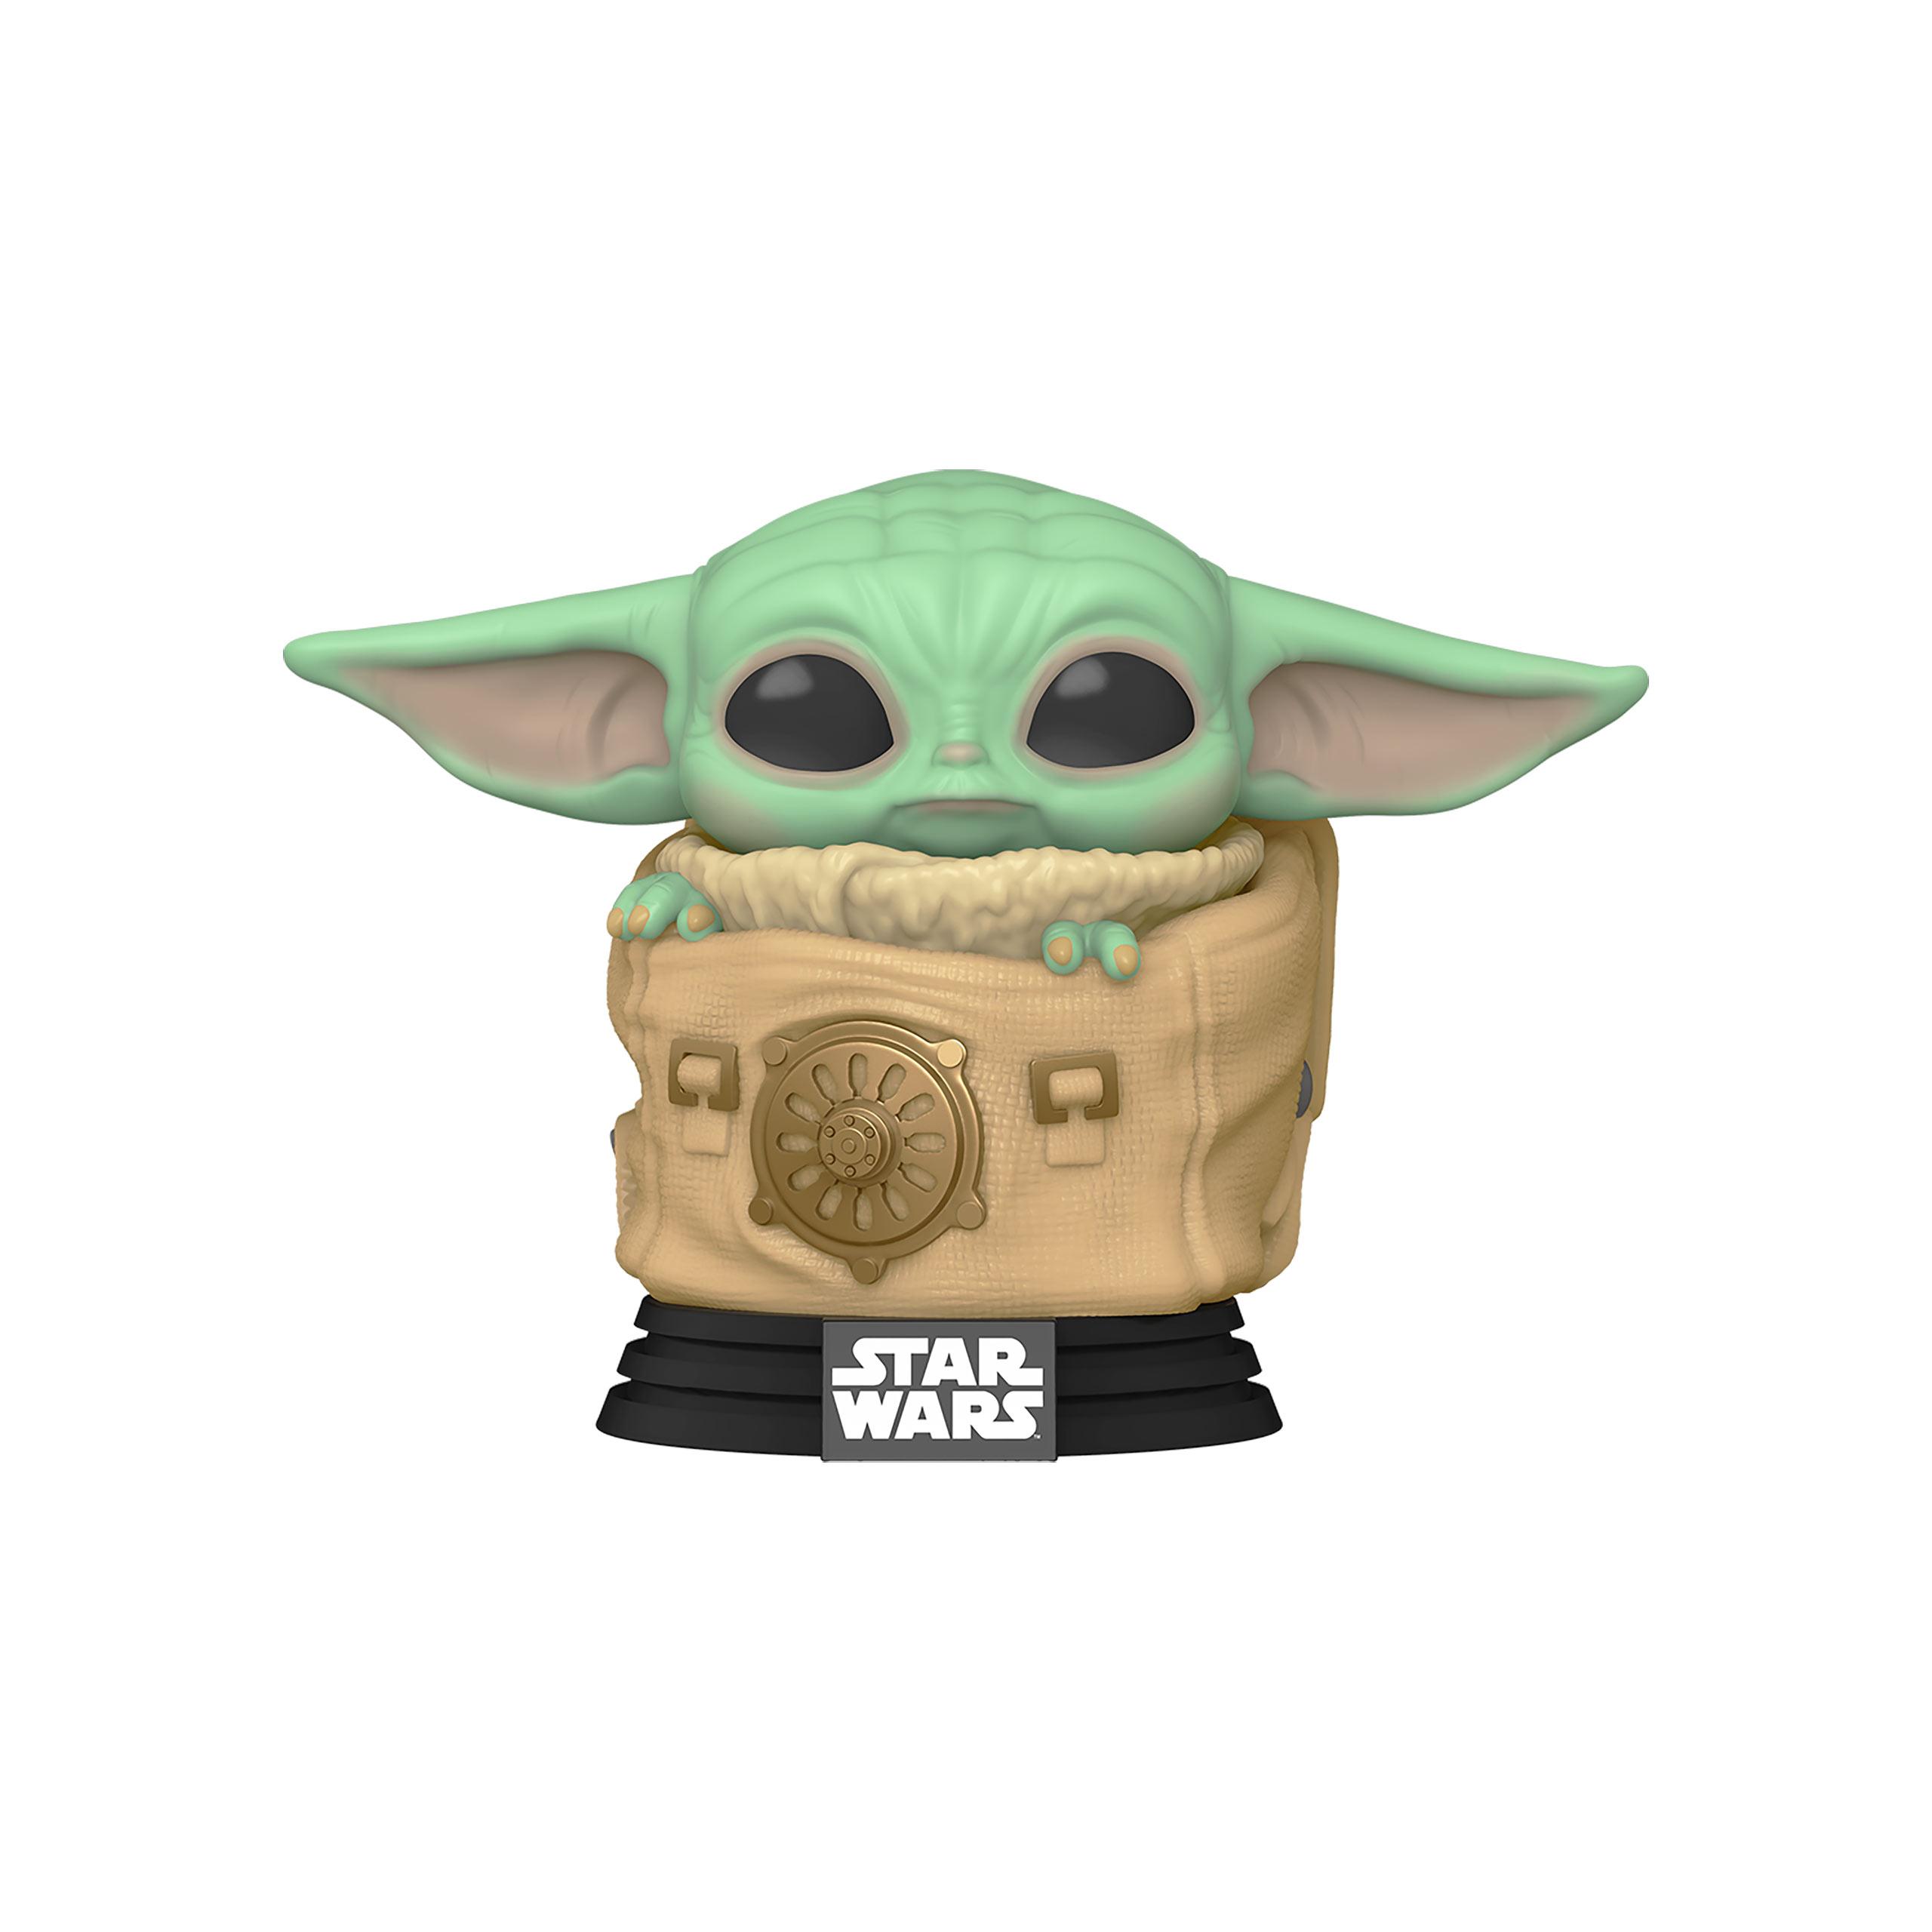 The Child in Tasche Funko Pop Wackelkopf-Figur - Star Wars The Mandalorian